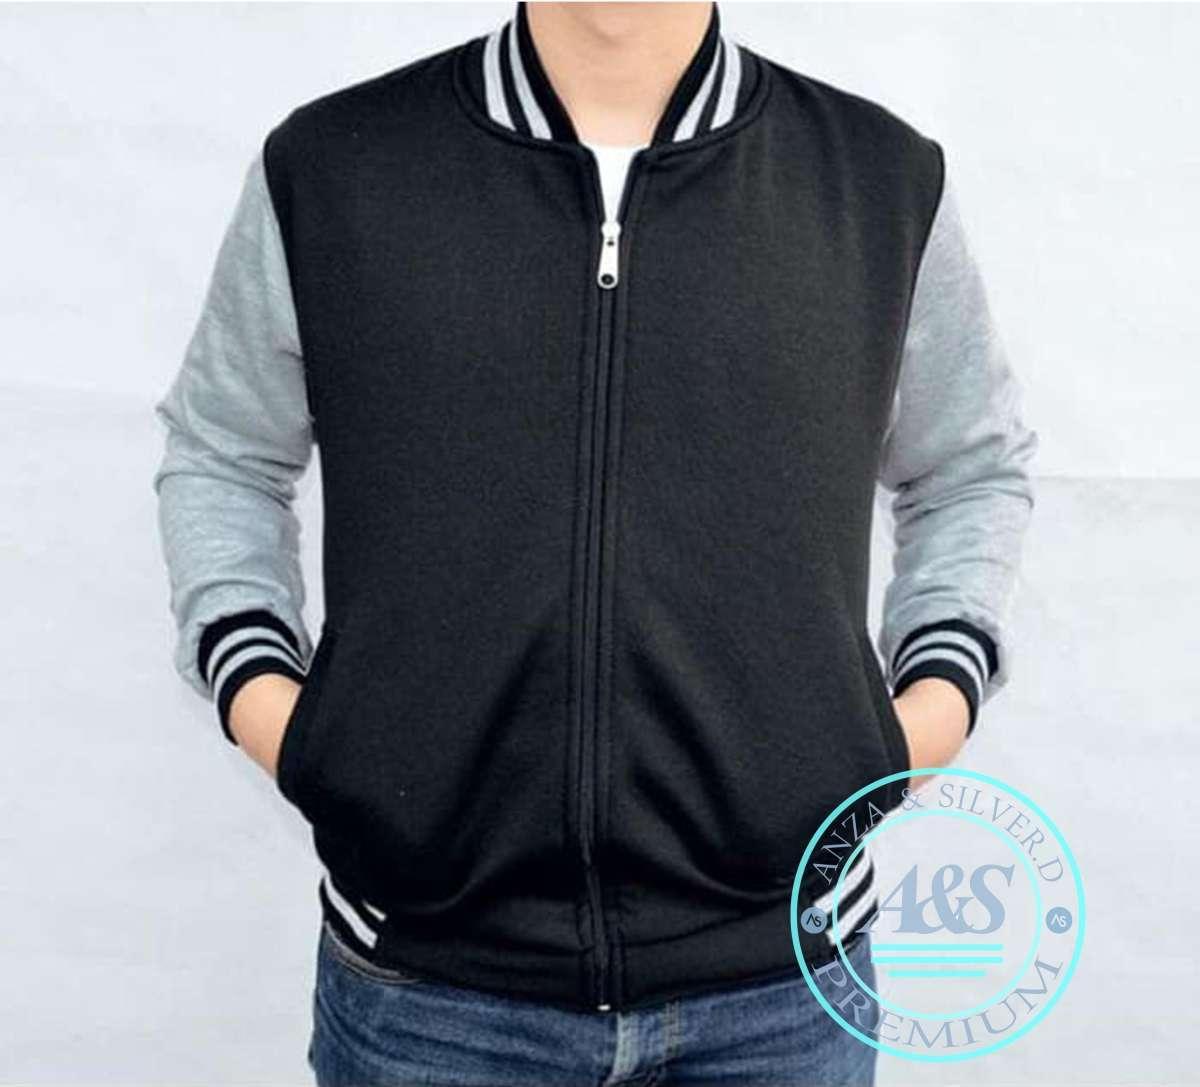 fahim store-jaket basebal/ / jaket bisbol / jaket baseball model  / jaket polos / jaket  / jaket baseball korea / jaket distro / jaket baseboll mura